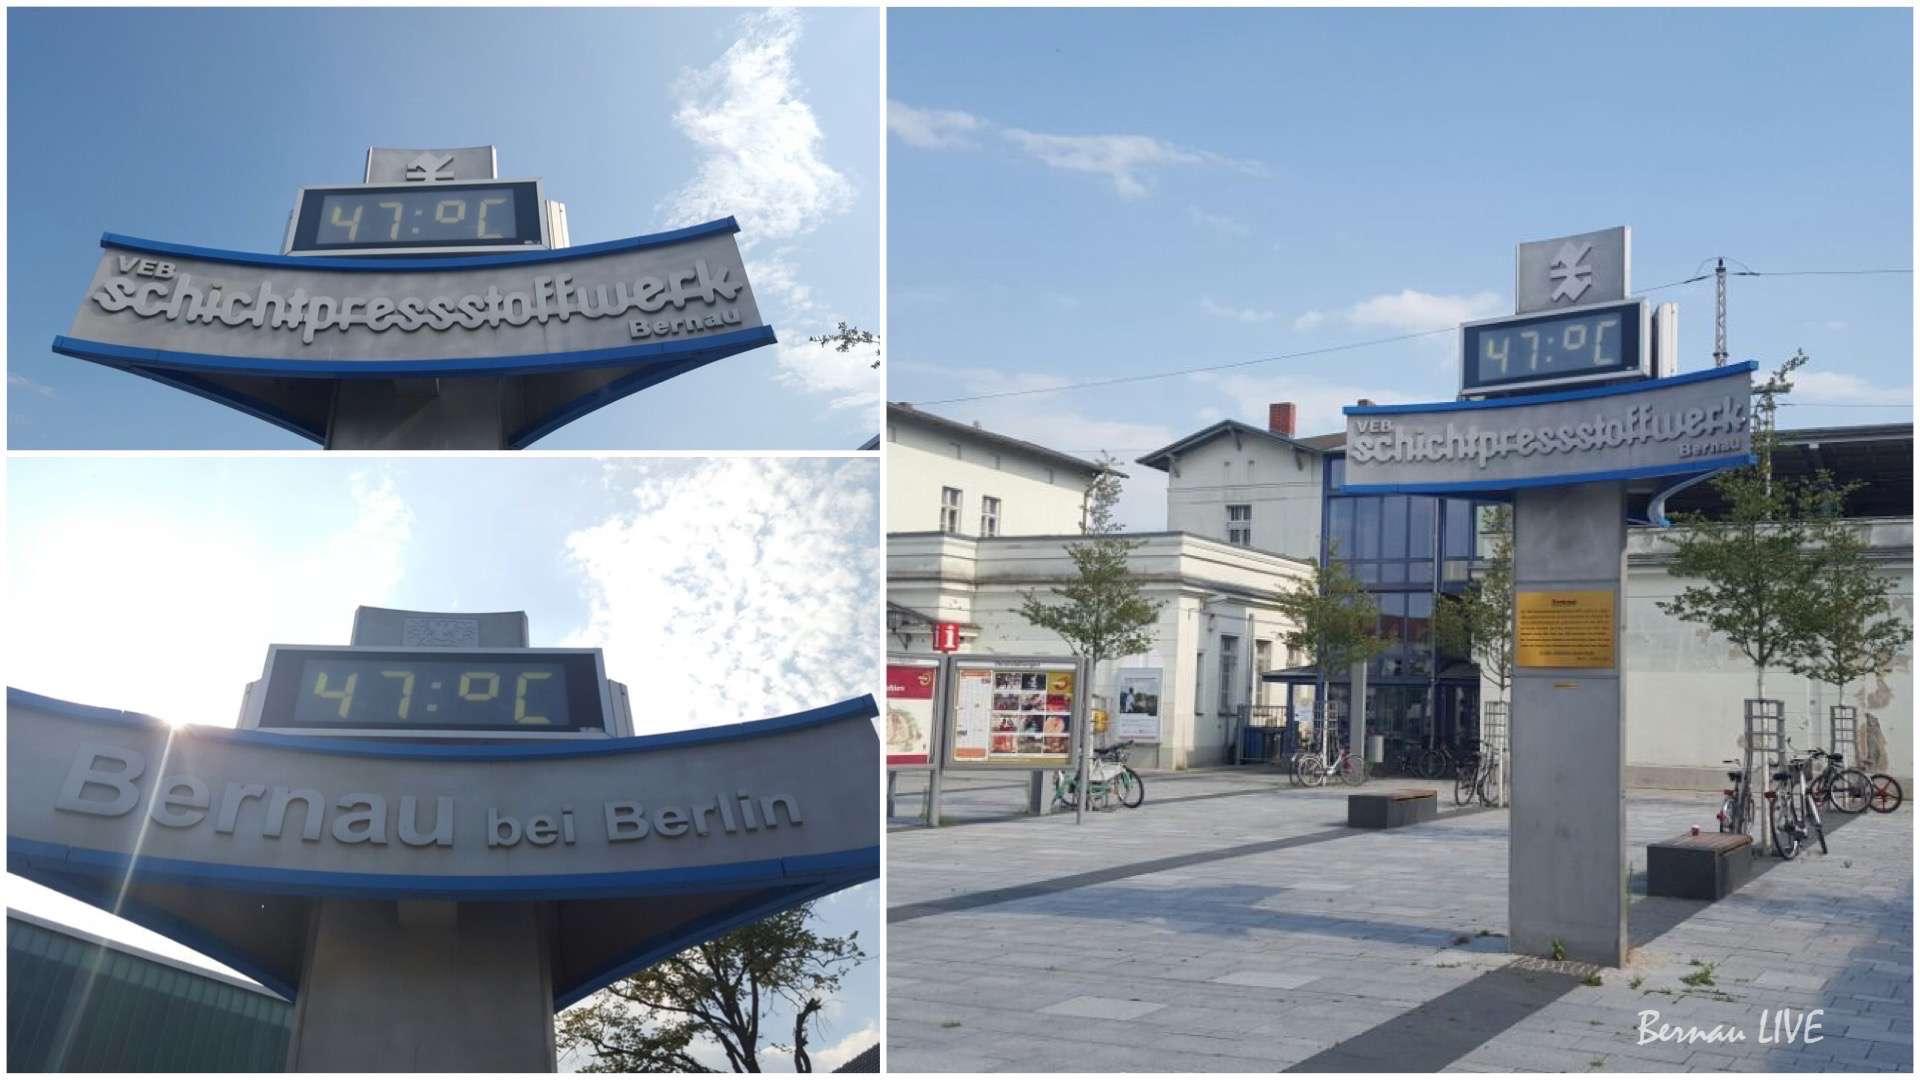 Sommer, bernau, Bernau LIVE, Barnim, Bahnhof Bernau, Wetter